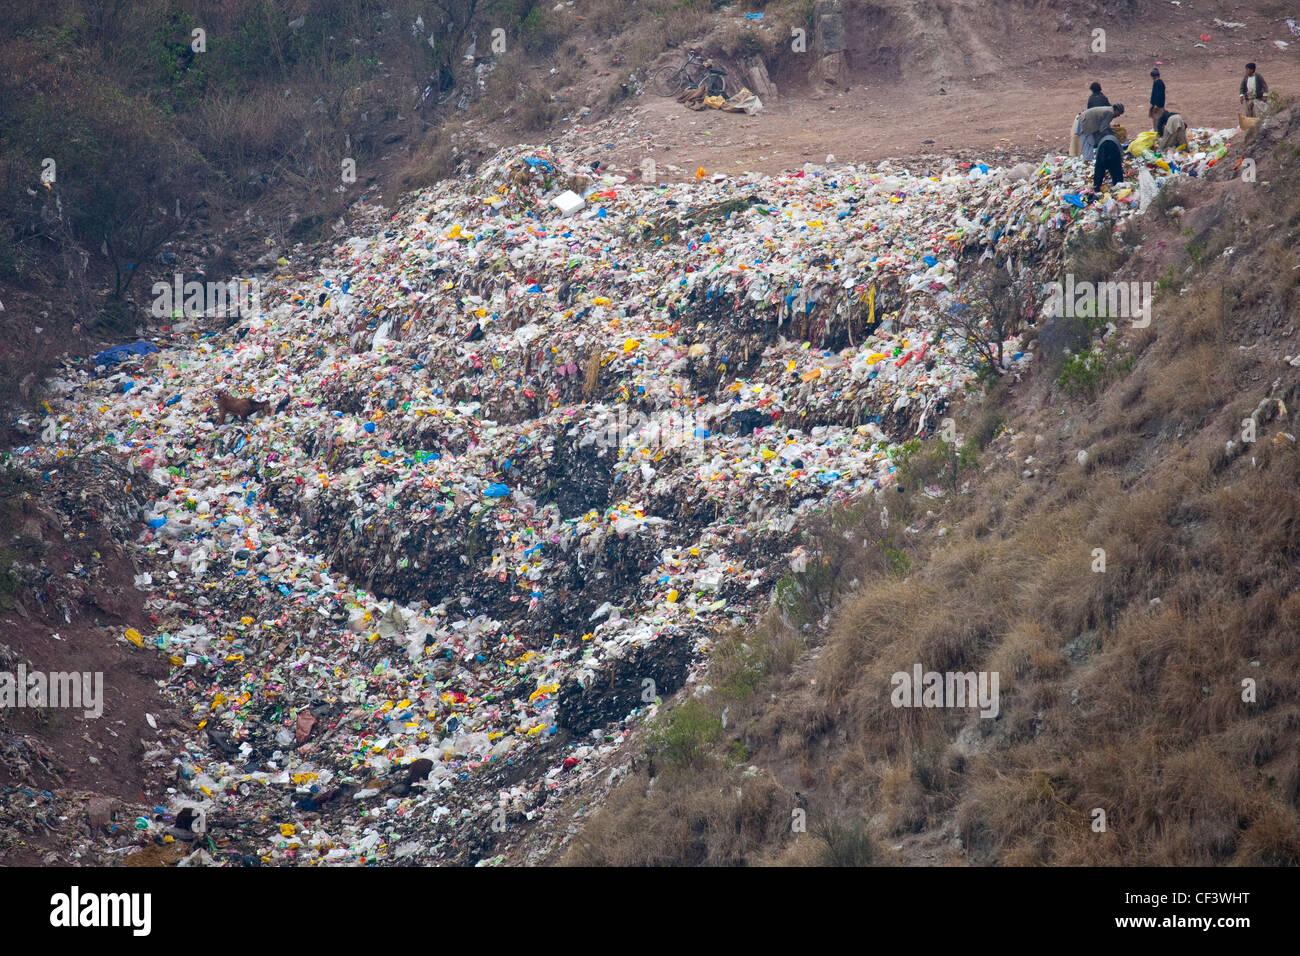 Hillside garbage, Islamabad, Pakistan - Stock Image